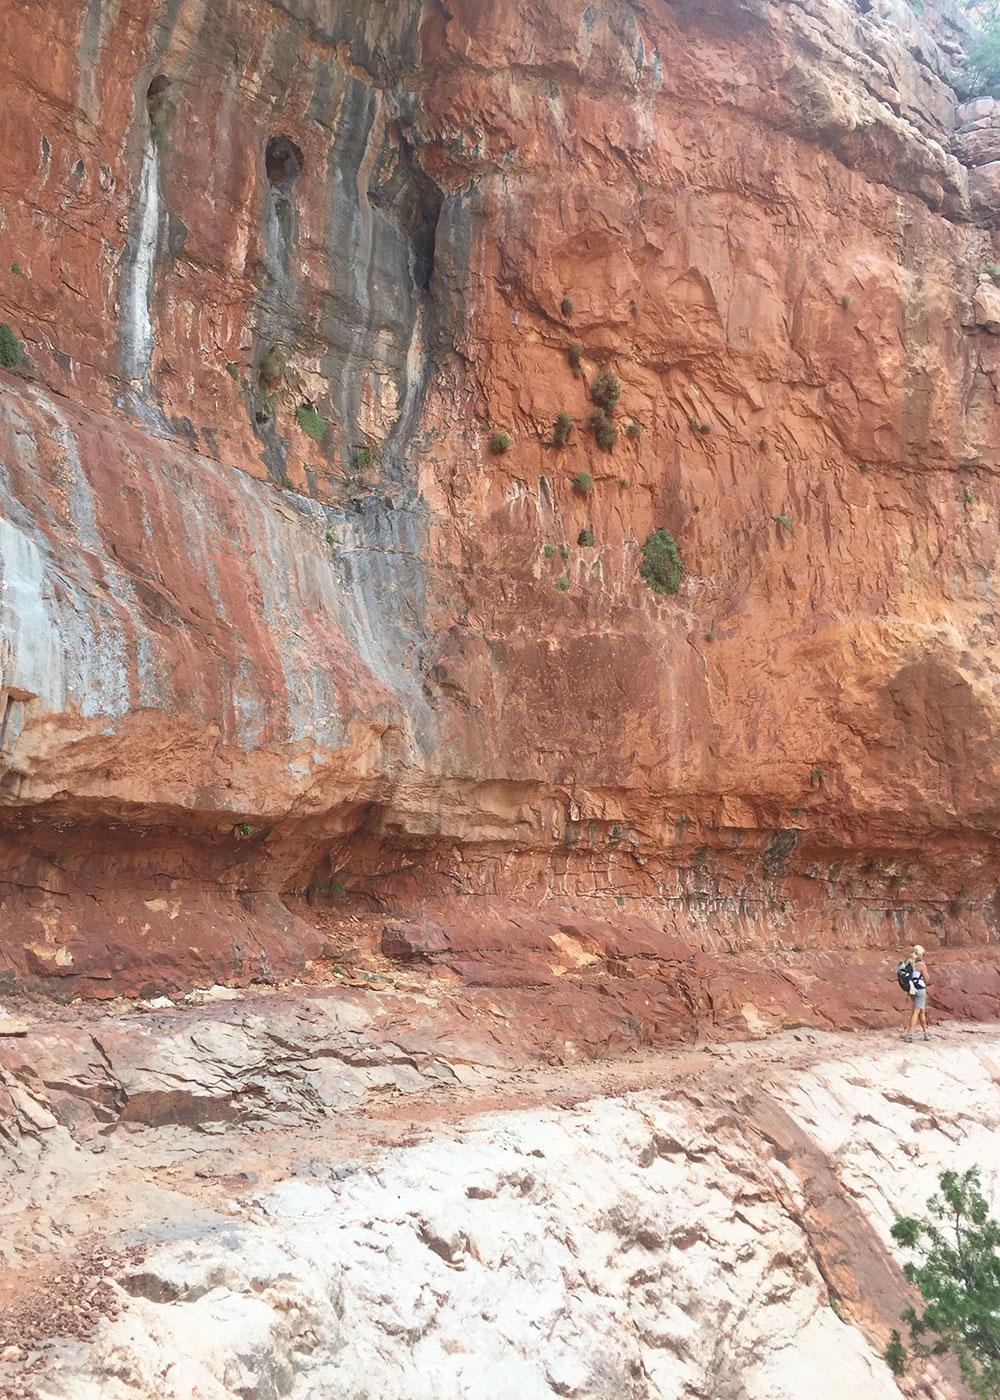 starting our ascent back up the north rim of the grand canyon   thelovedesignedlife.com #grandcanyon #northrim #rimtorim